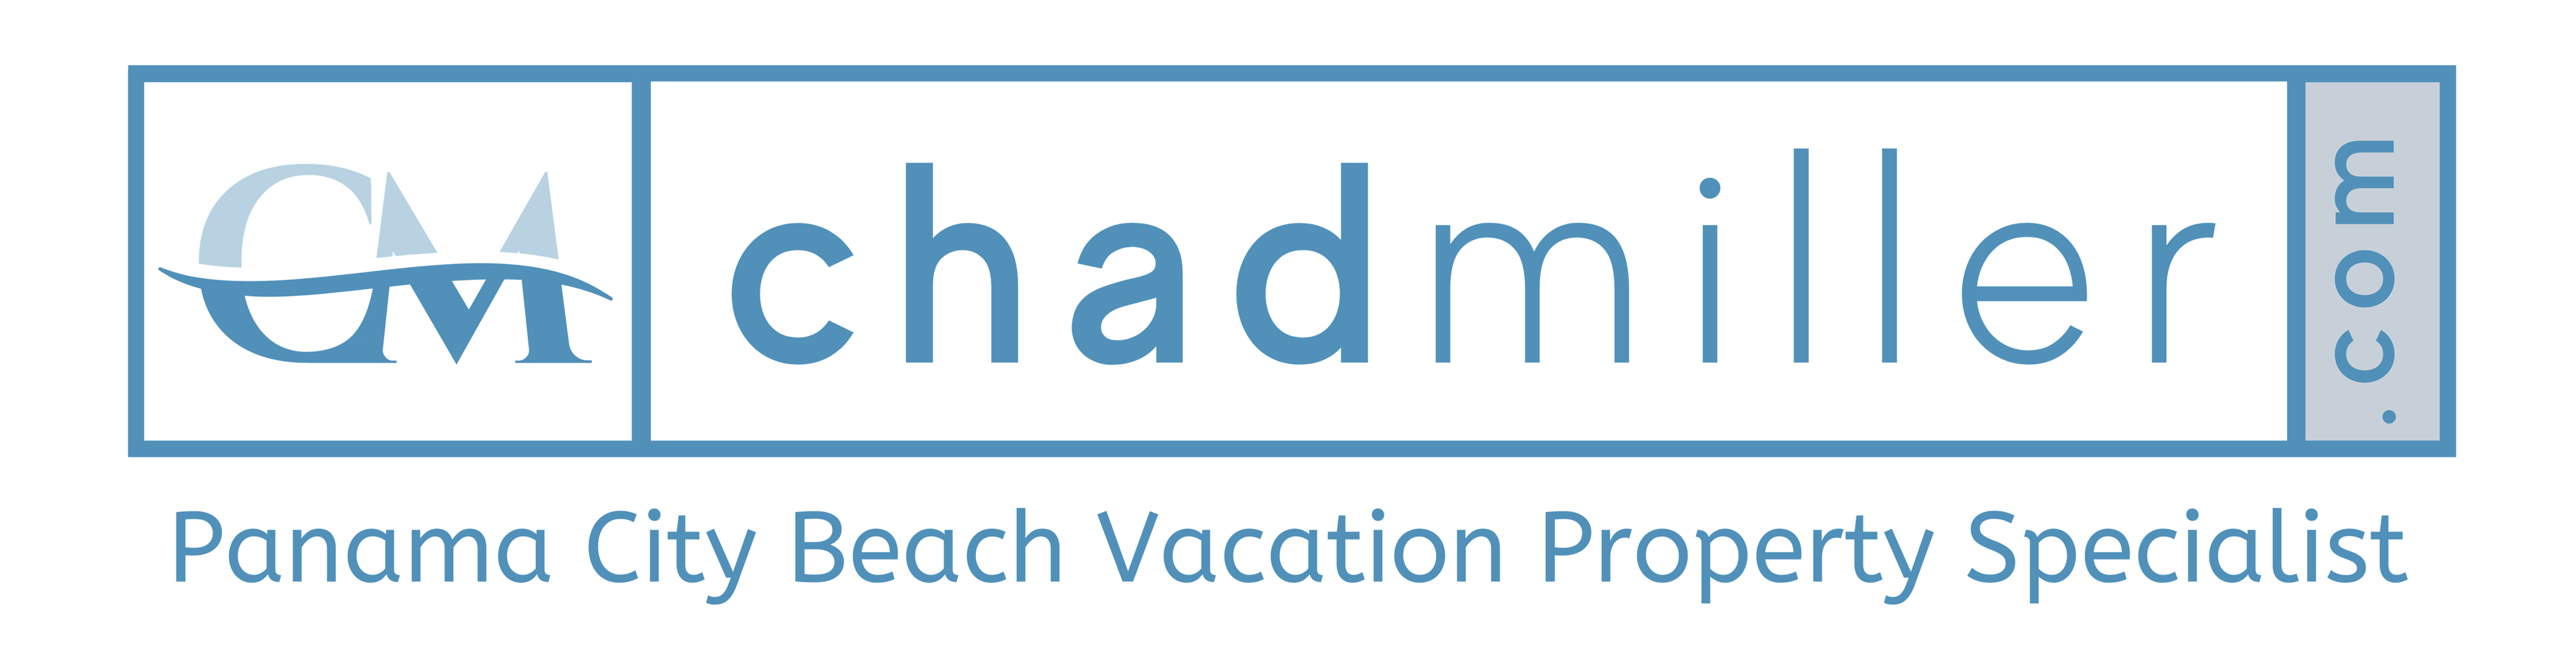 CM and Chad Miller header logo